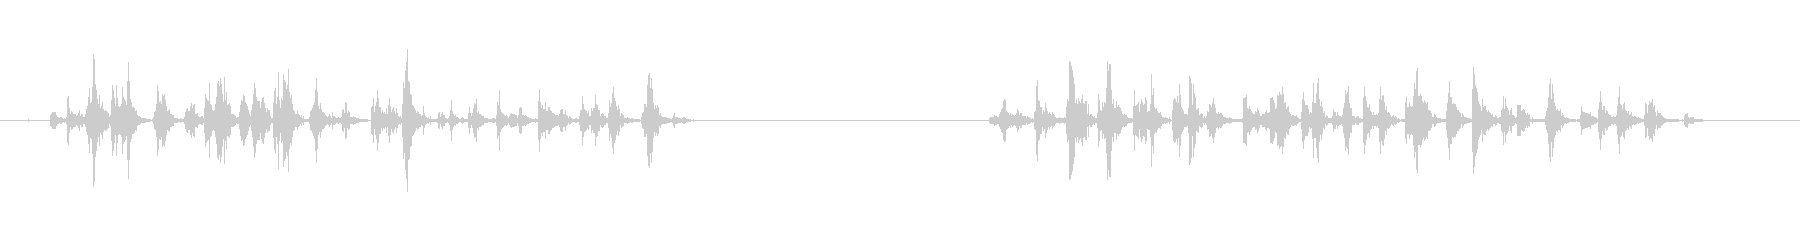 2Xを実行する足跡宇宙船グループの未再生の波形